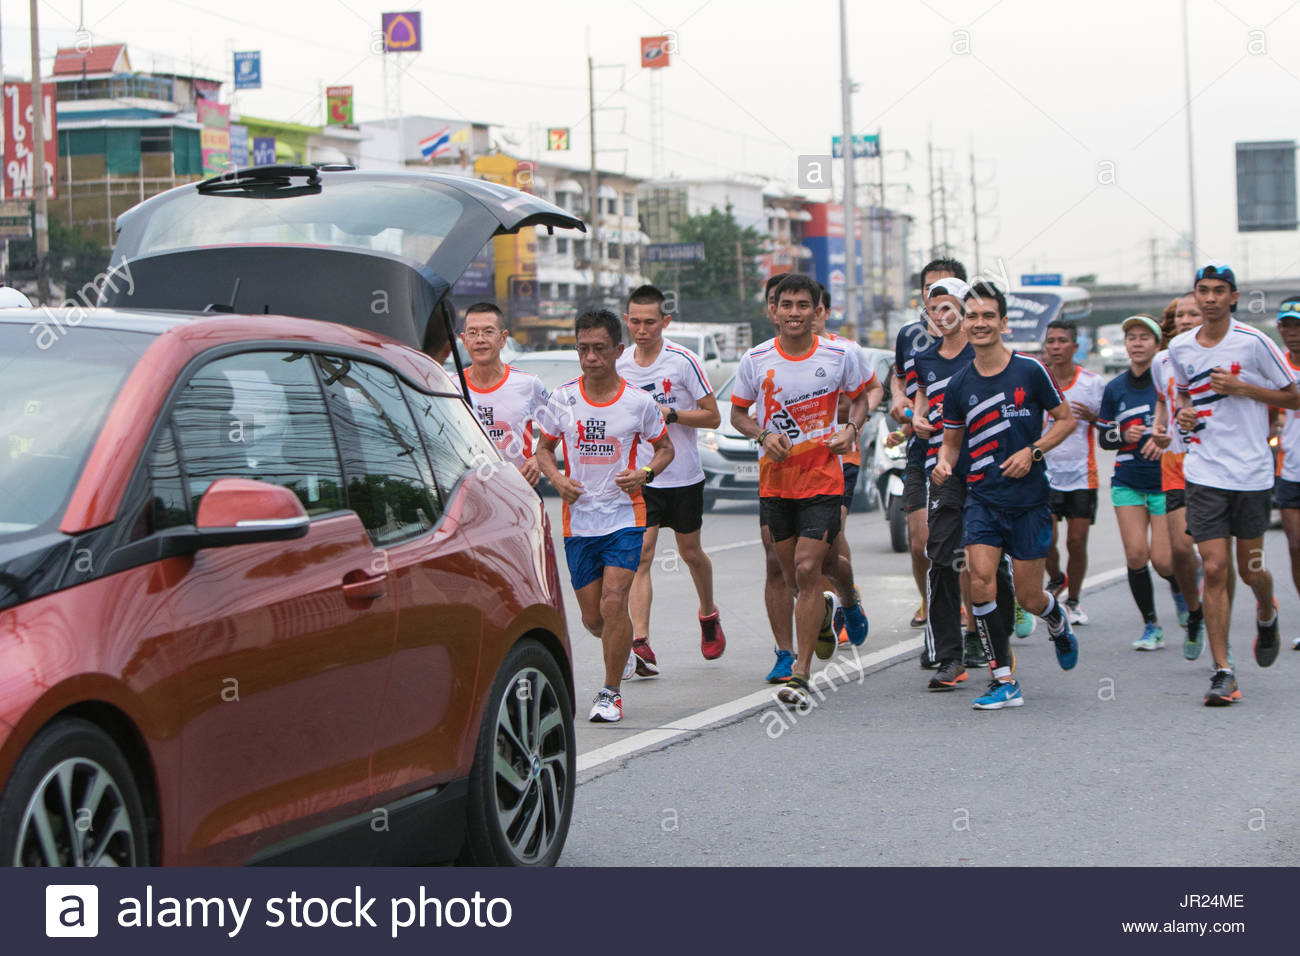 Pathumthani Thailand - July 30 : 'KruDin' Sathavorn Chanpongsri Former Thai national athlete run 750 km, from Bangkok to Phayao, charity for Phayao sc - Stock Image